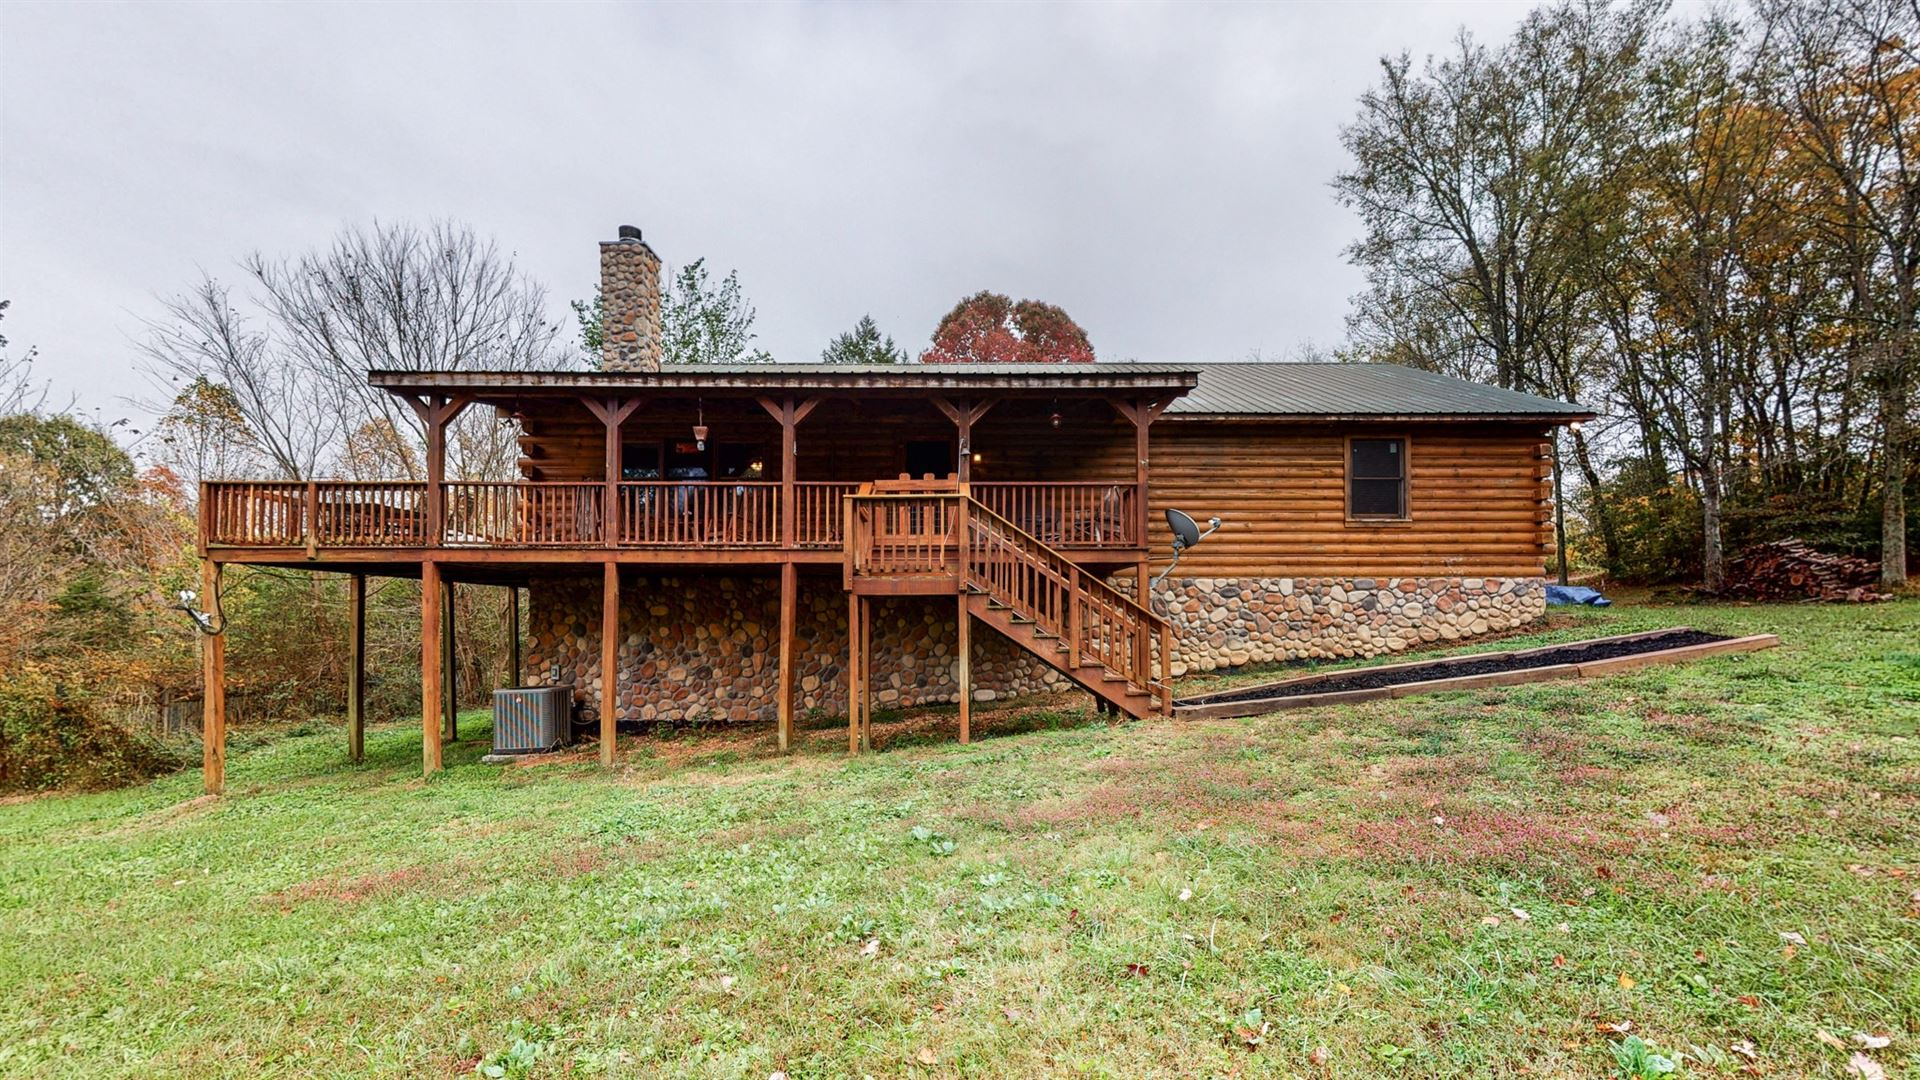 Photo of 3001 Crafton Rd, Spring Hill, TN 37174 (MLS # 2202246)